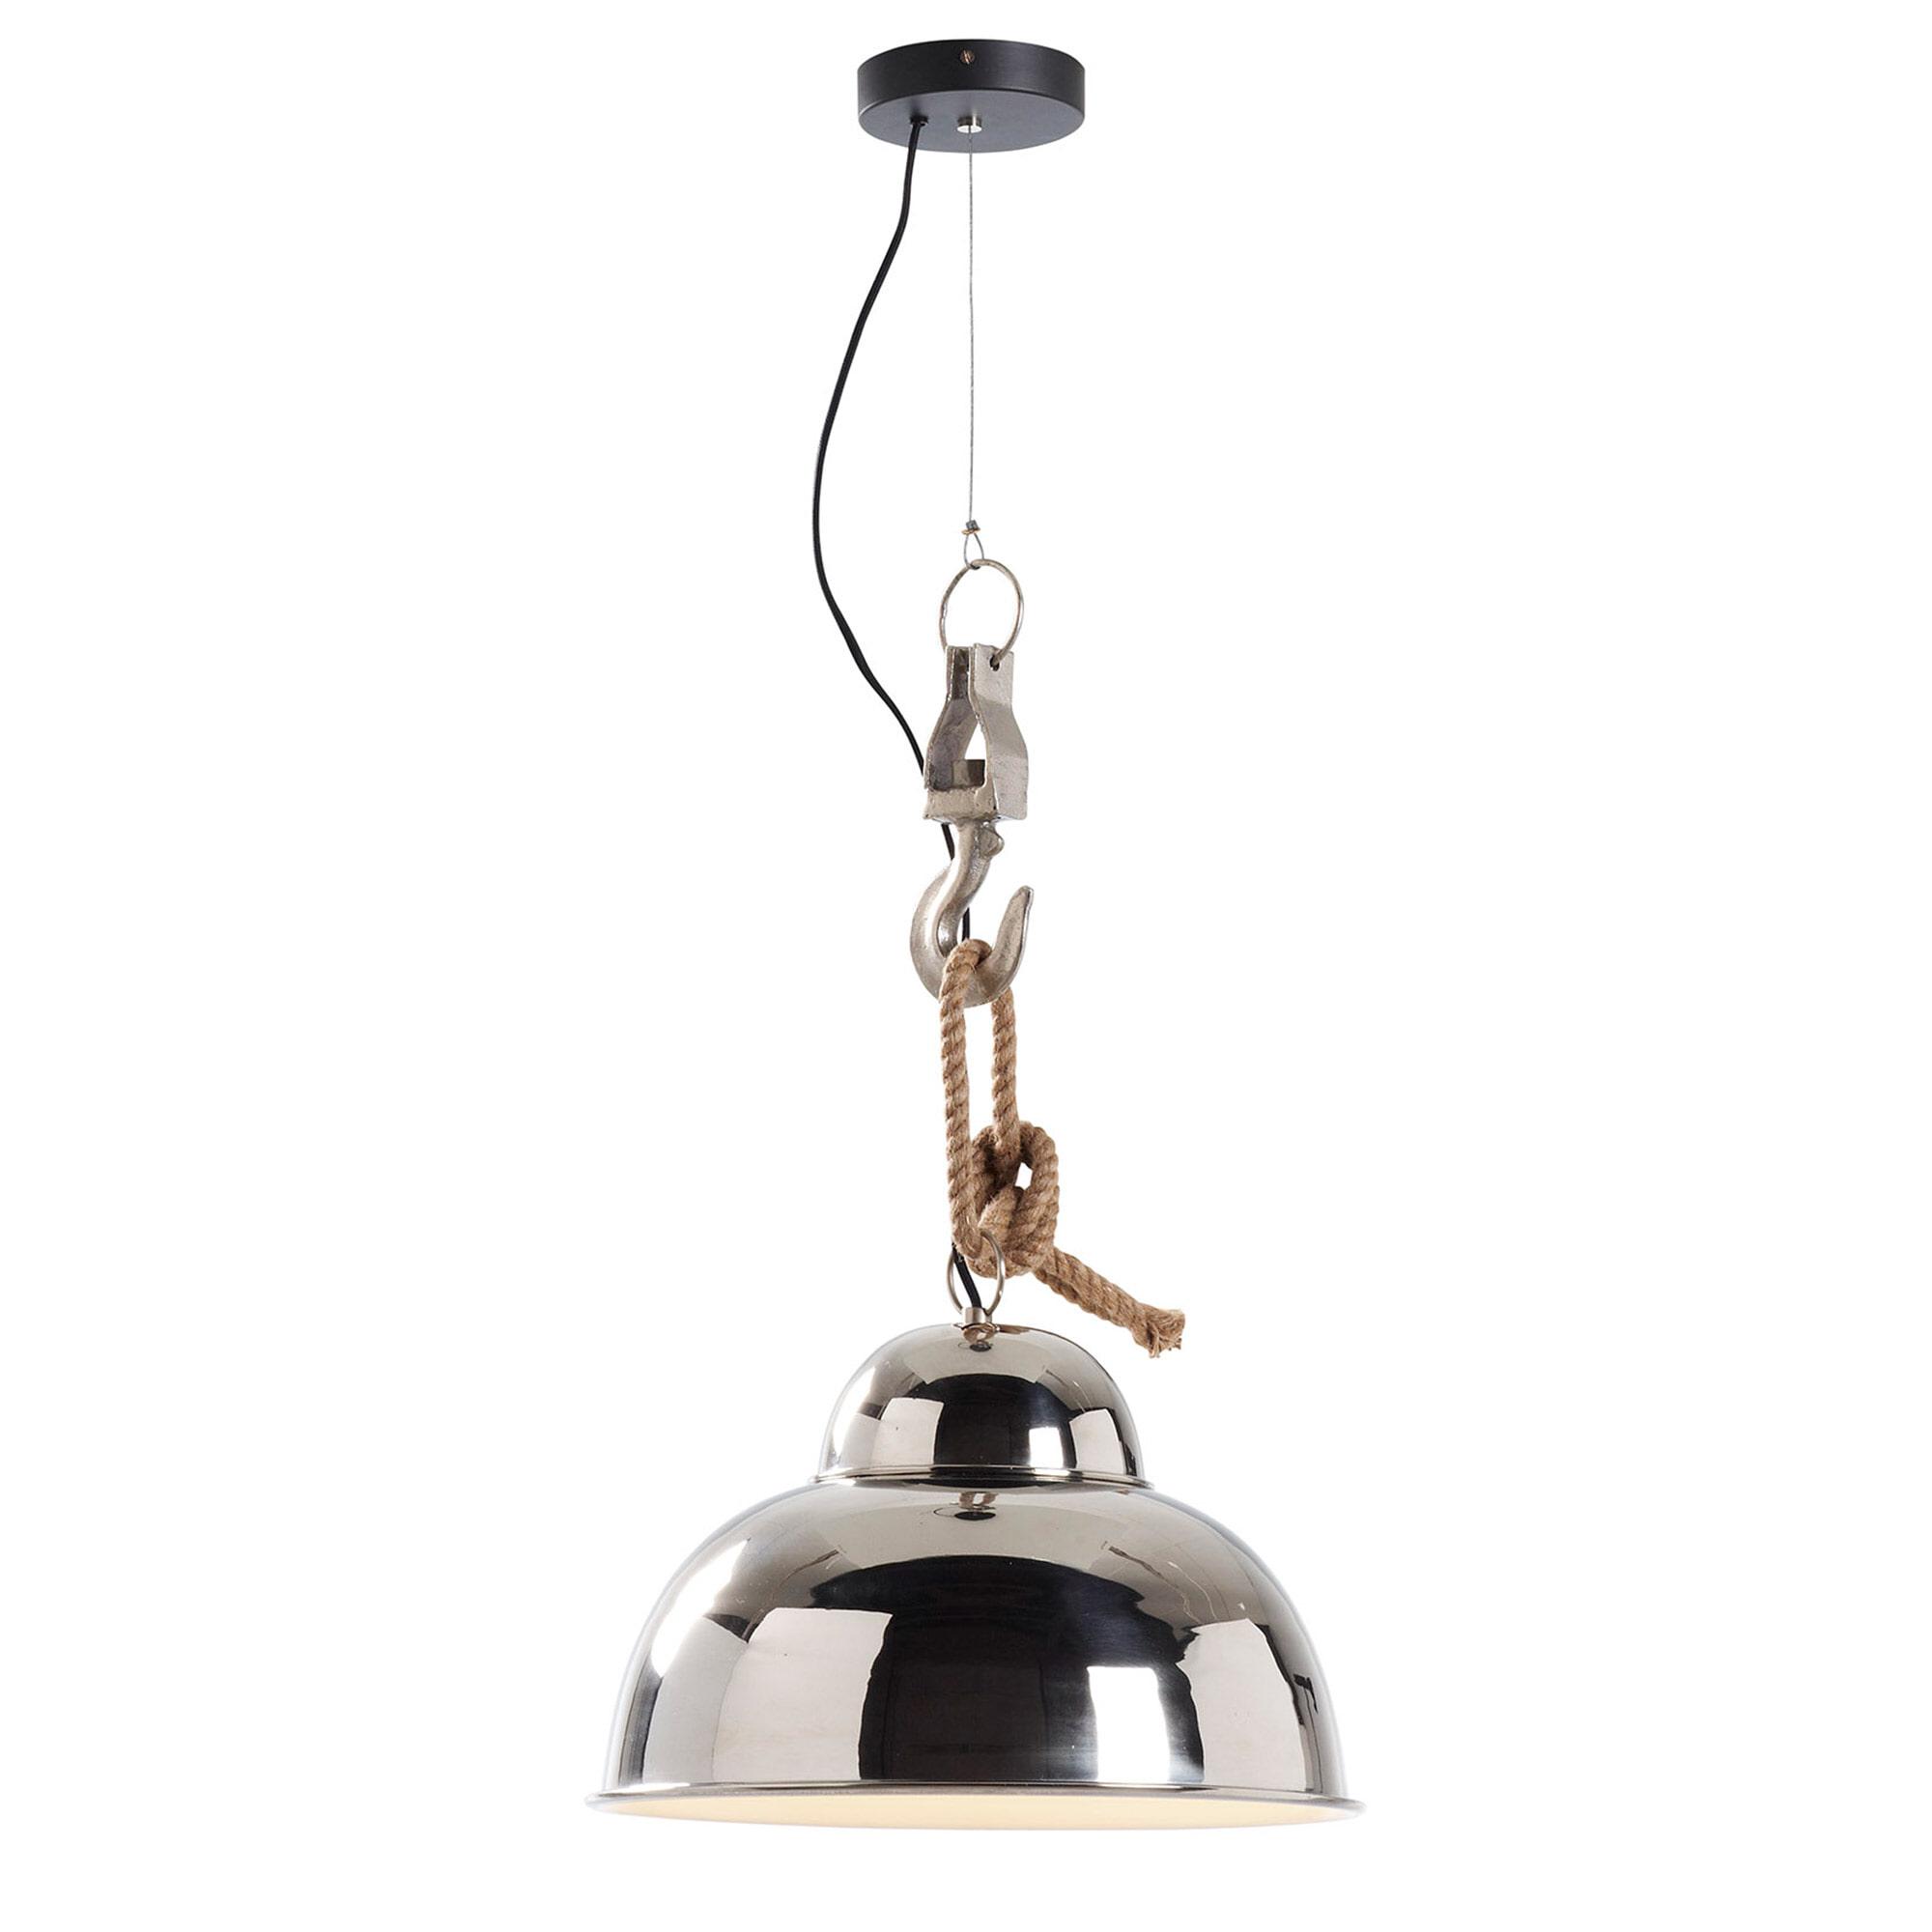 Kave Home Hanglamp 'Gianna', kleur zilver